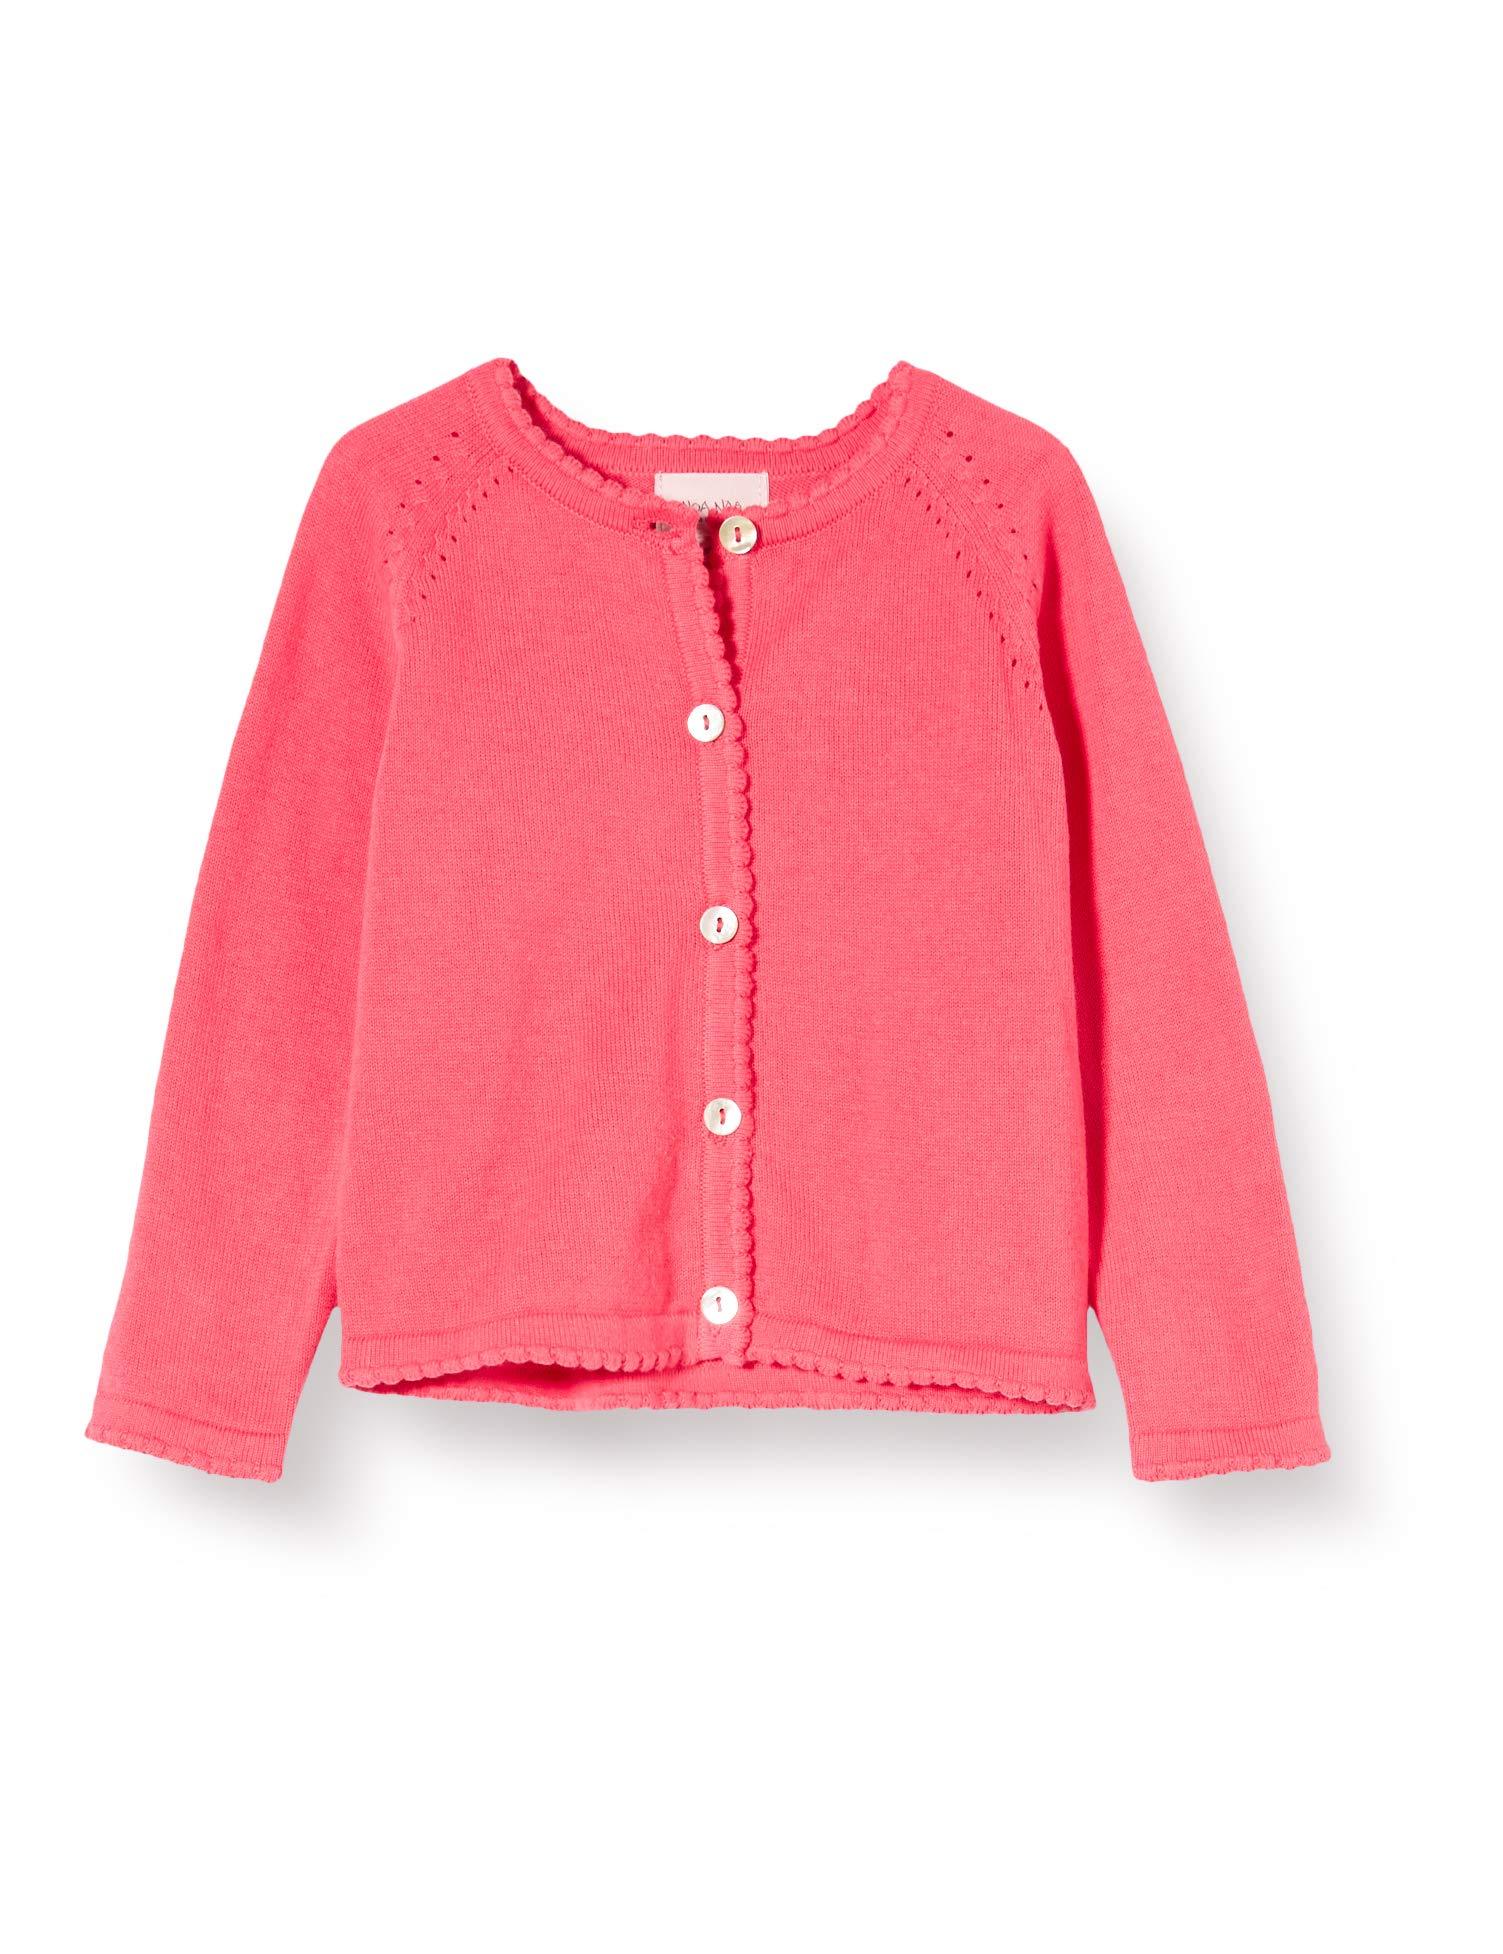 Noa Noa Miniature Baby Basic Light Knit Chaqueta Punto para Bebés 1